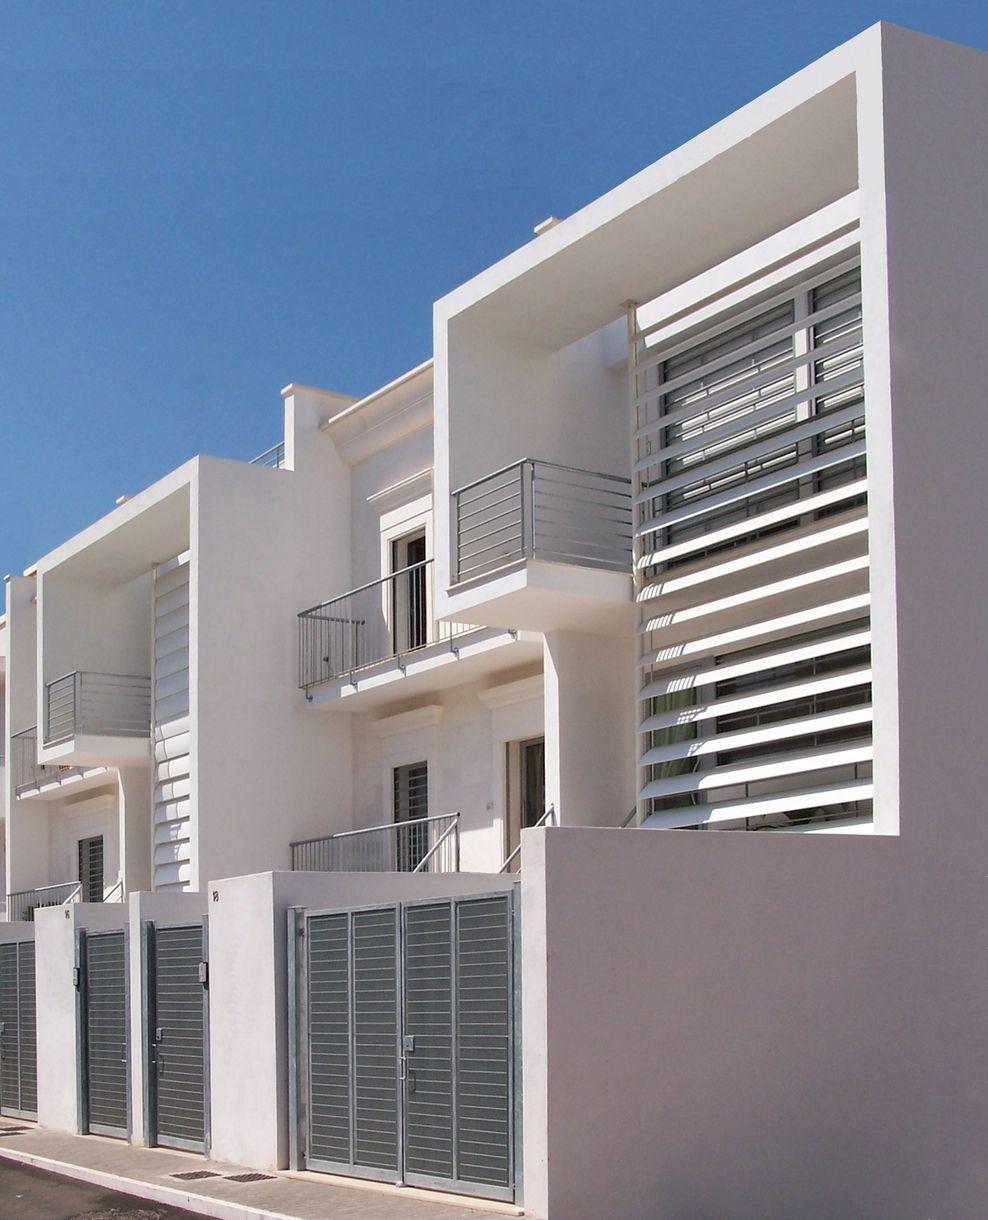 Residential complex arquitectura pinterest for Casa moderna arquitectura